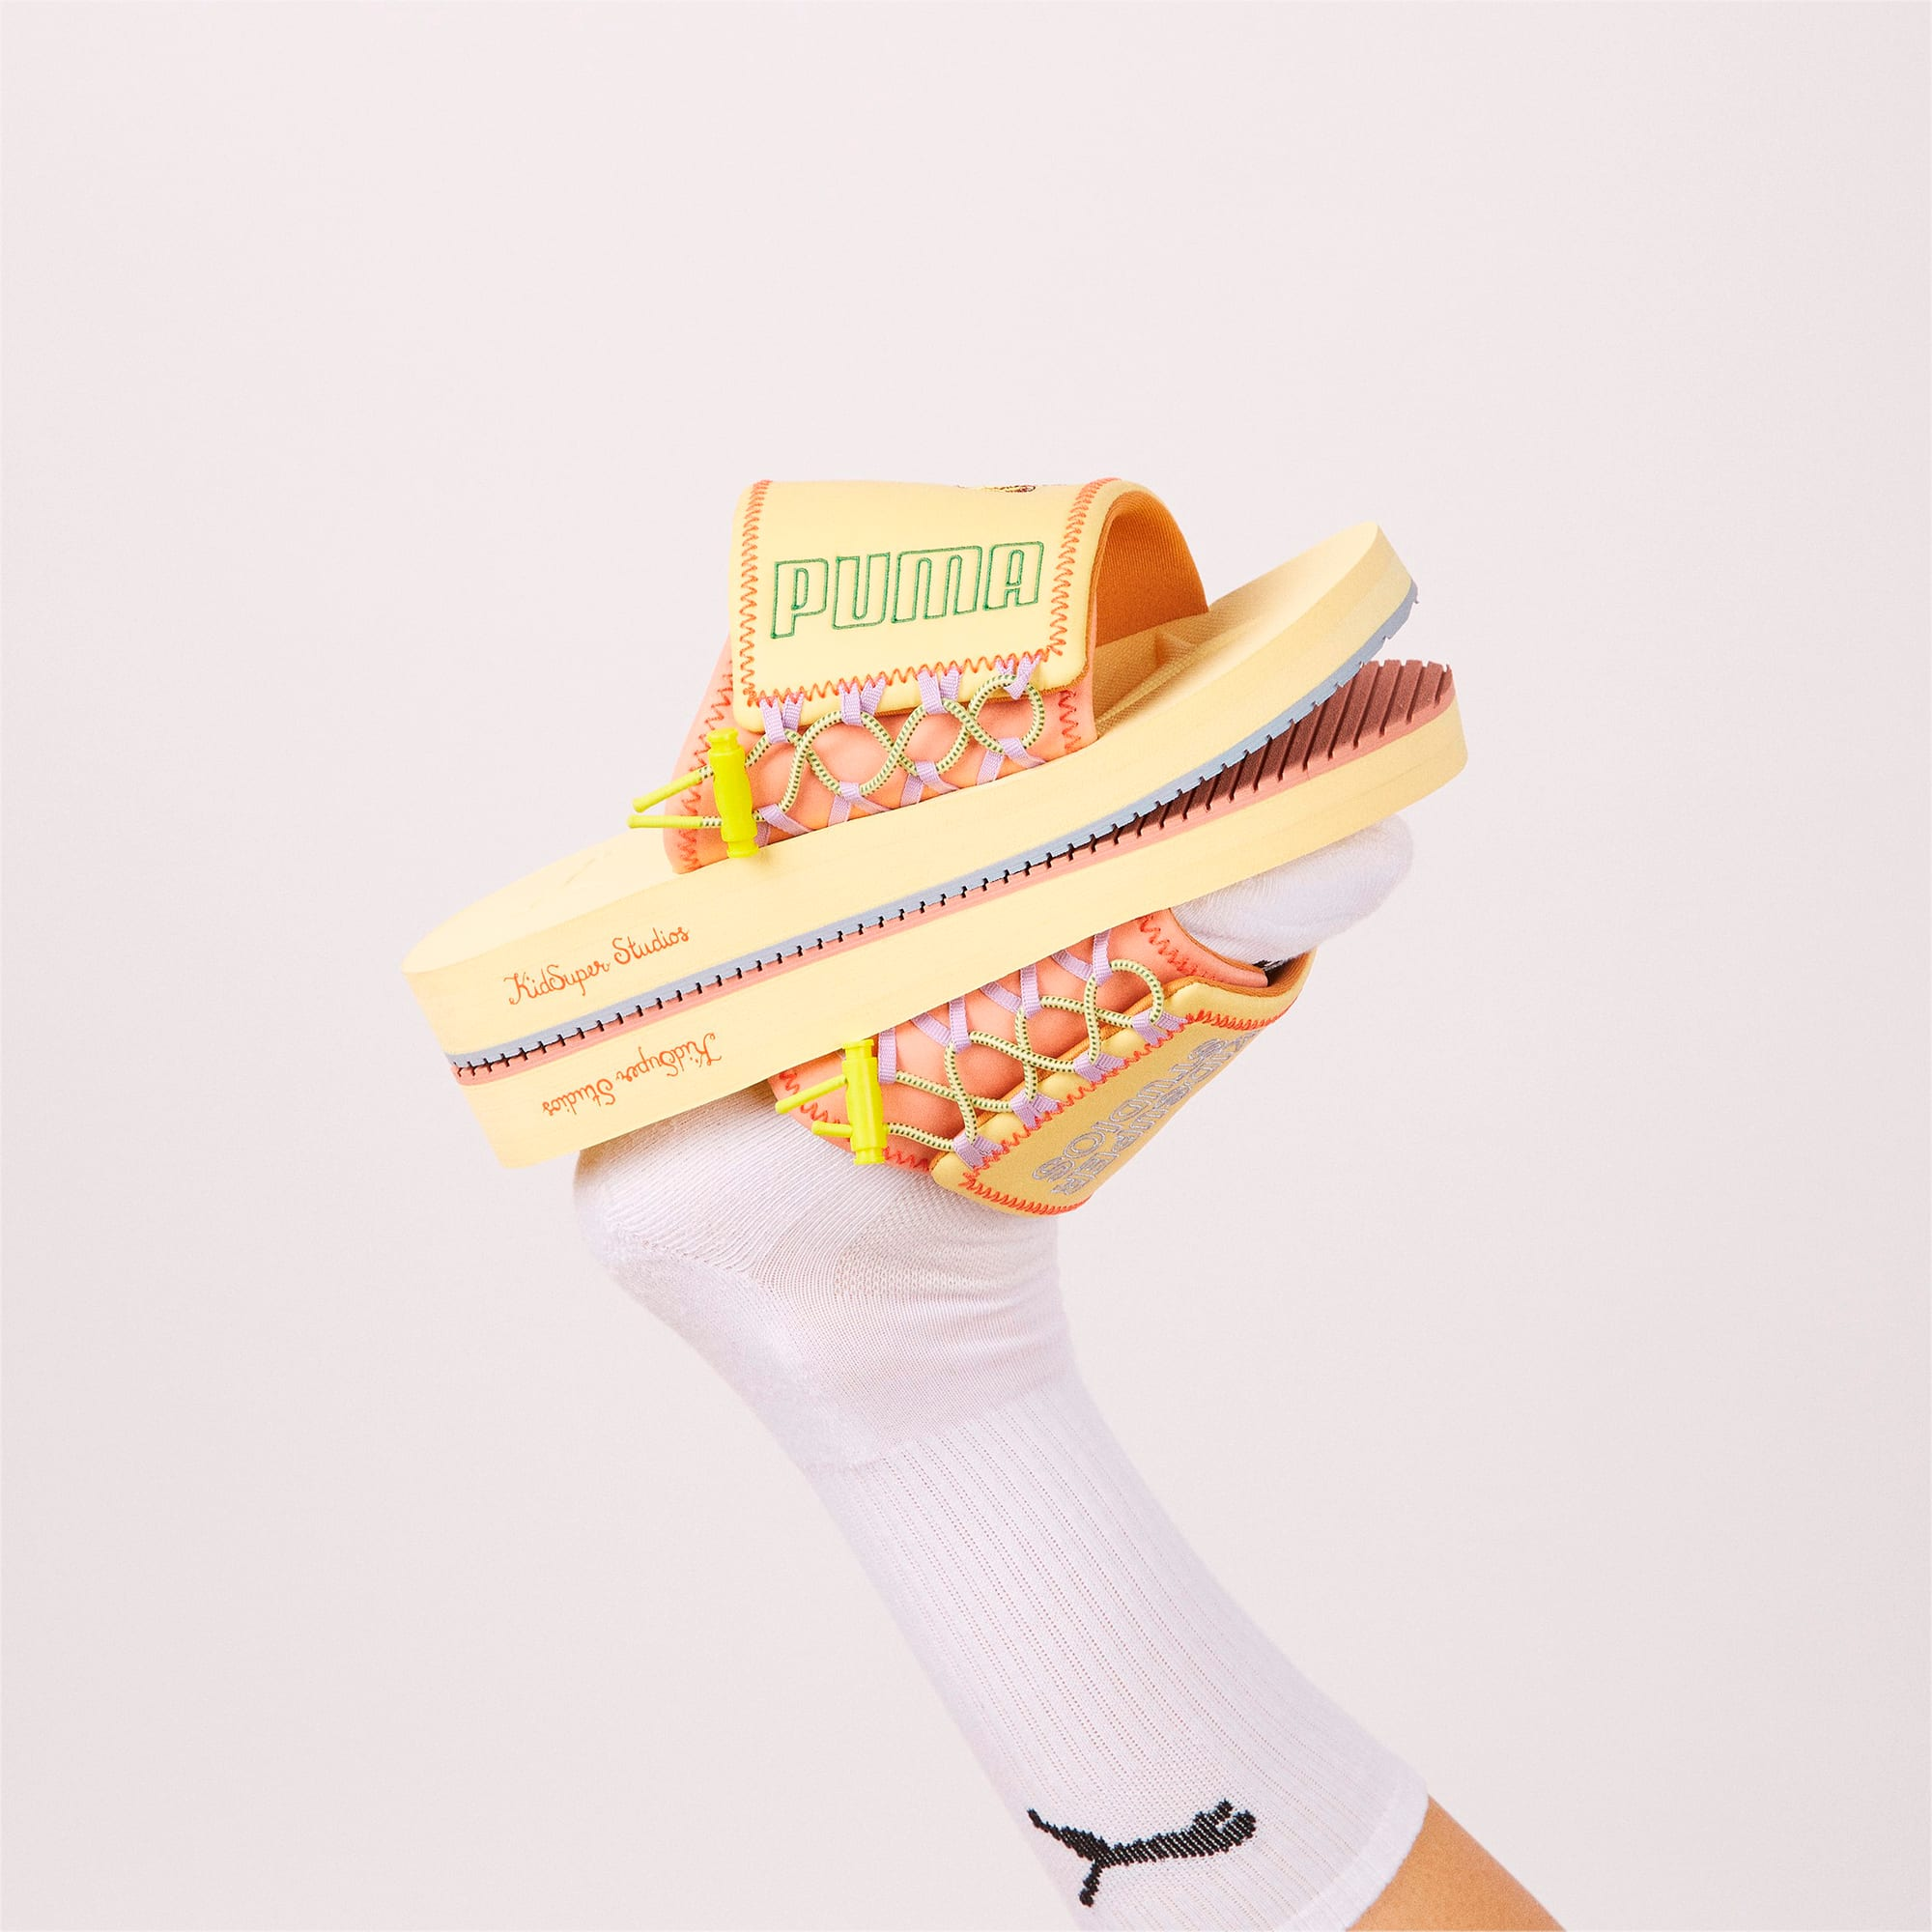 PUMA x KIDSUPER STUDIOS PUMA Wilo Slides, Mellow Yellow-Peach Beige, extralarge